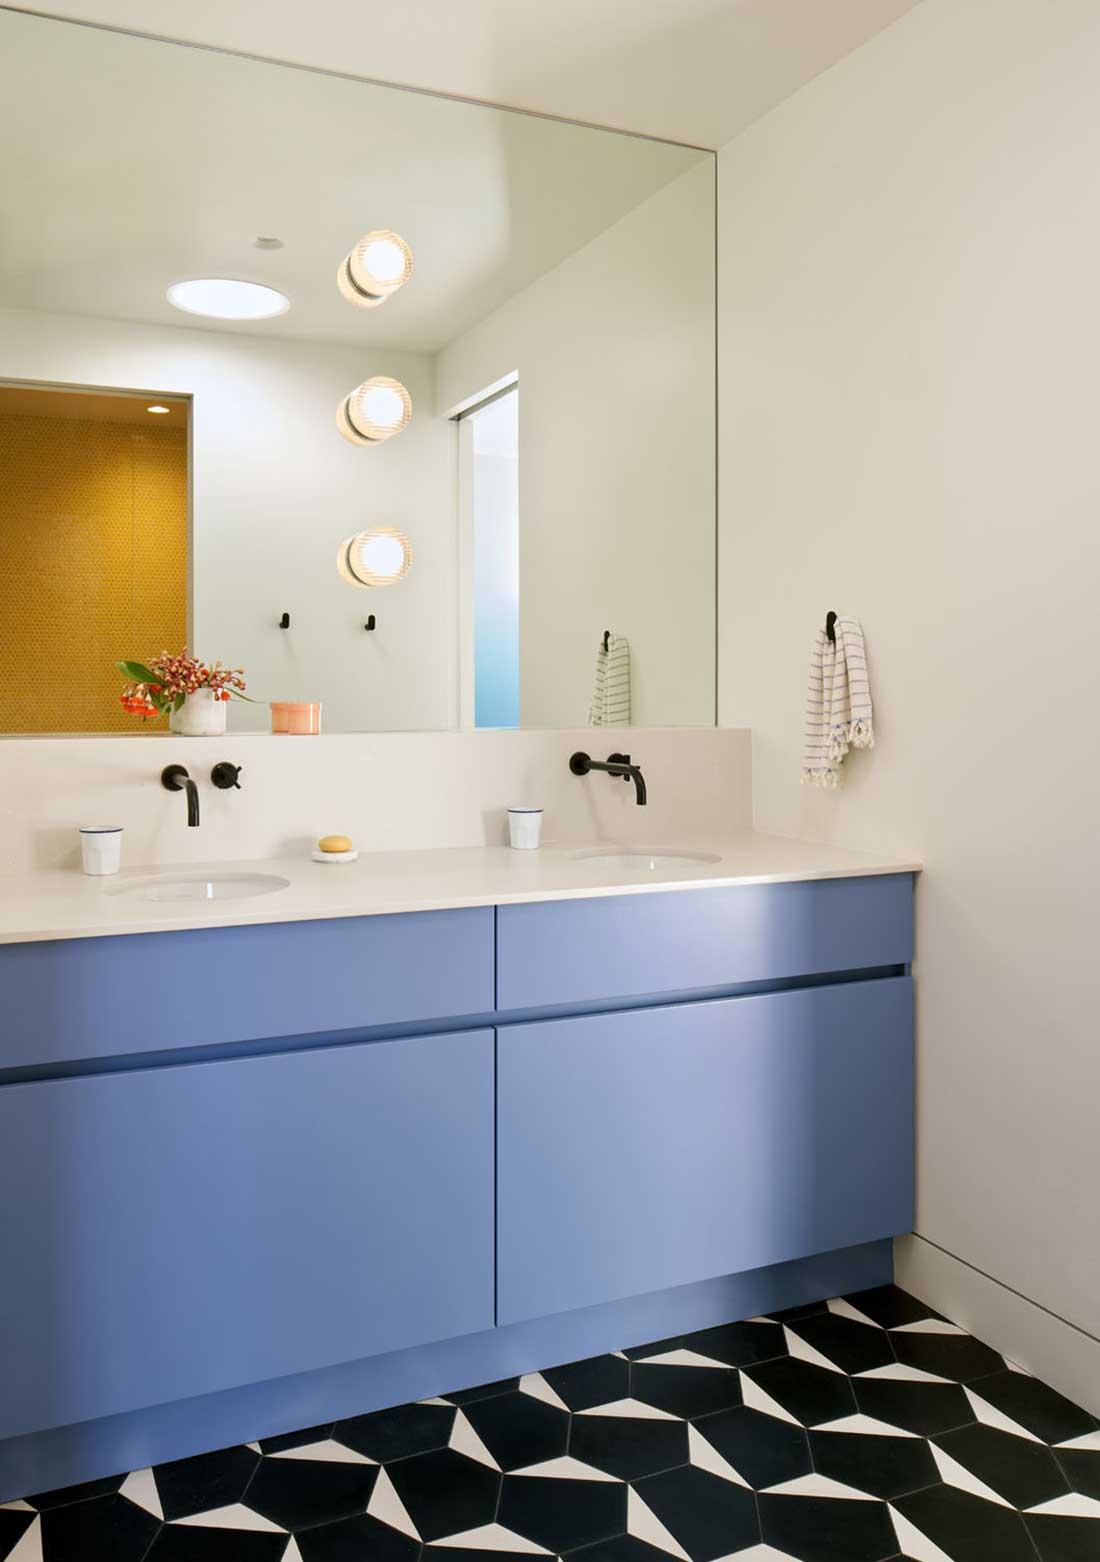 Alison Damonte Elevated Mood - bathroom with big mirror